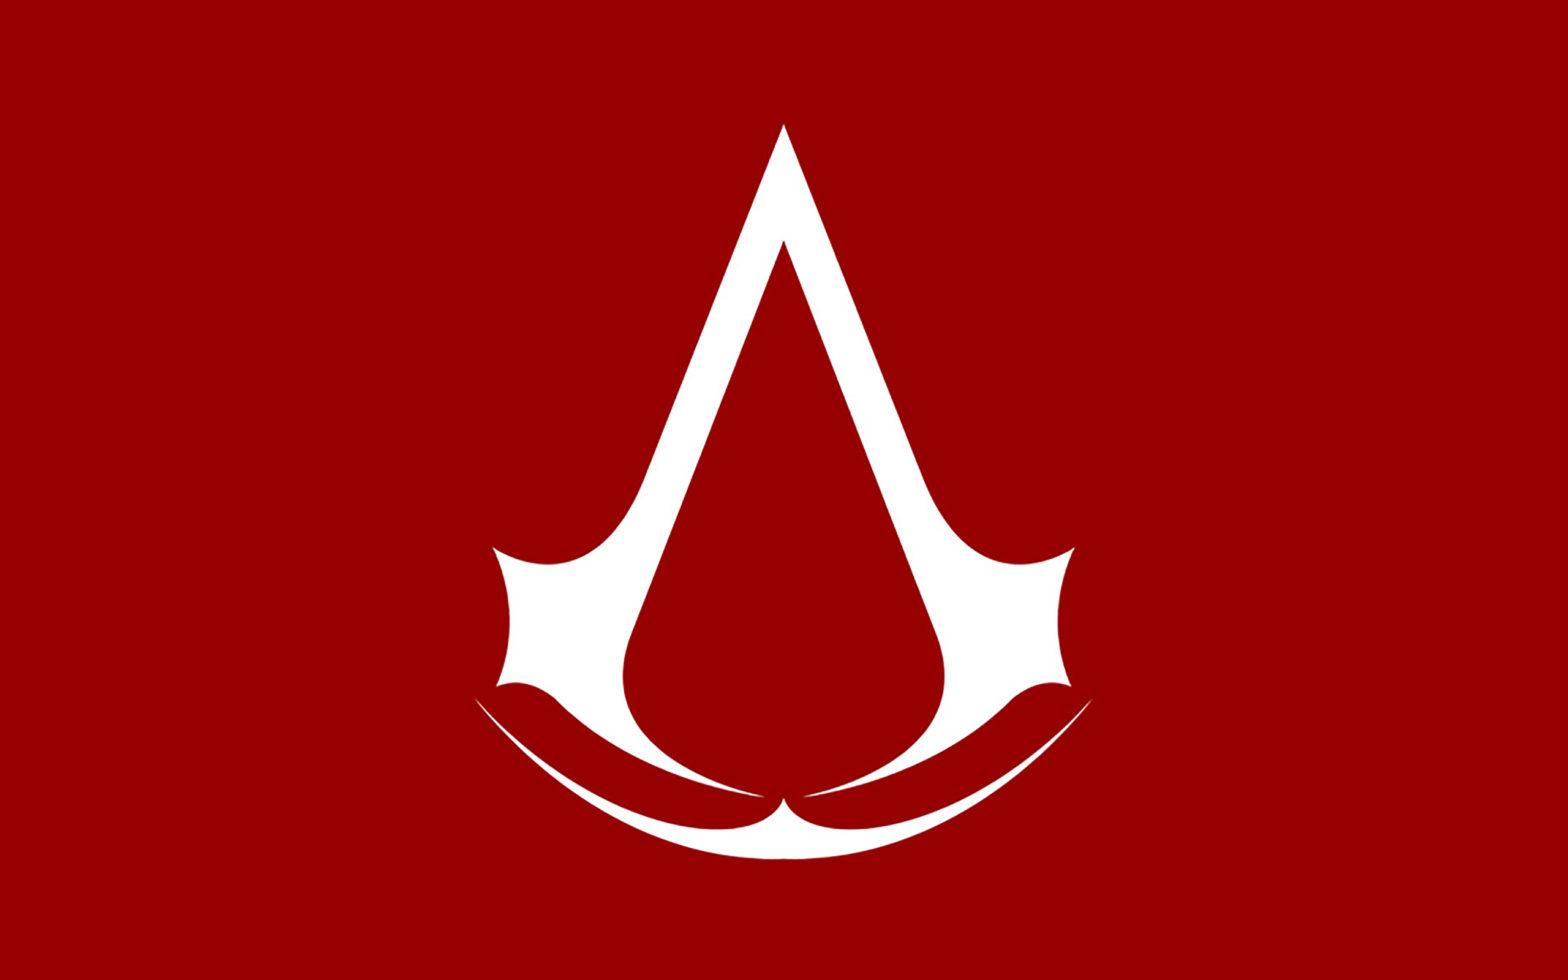 Assassin's Creed Teaser